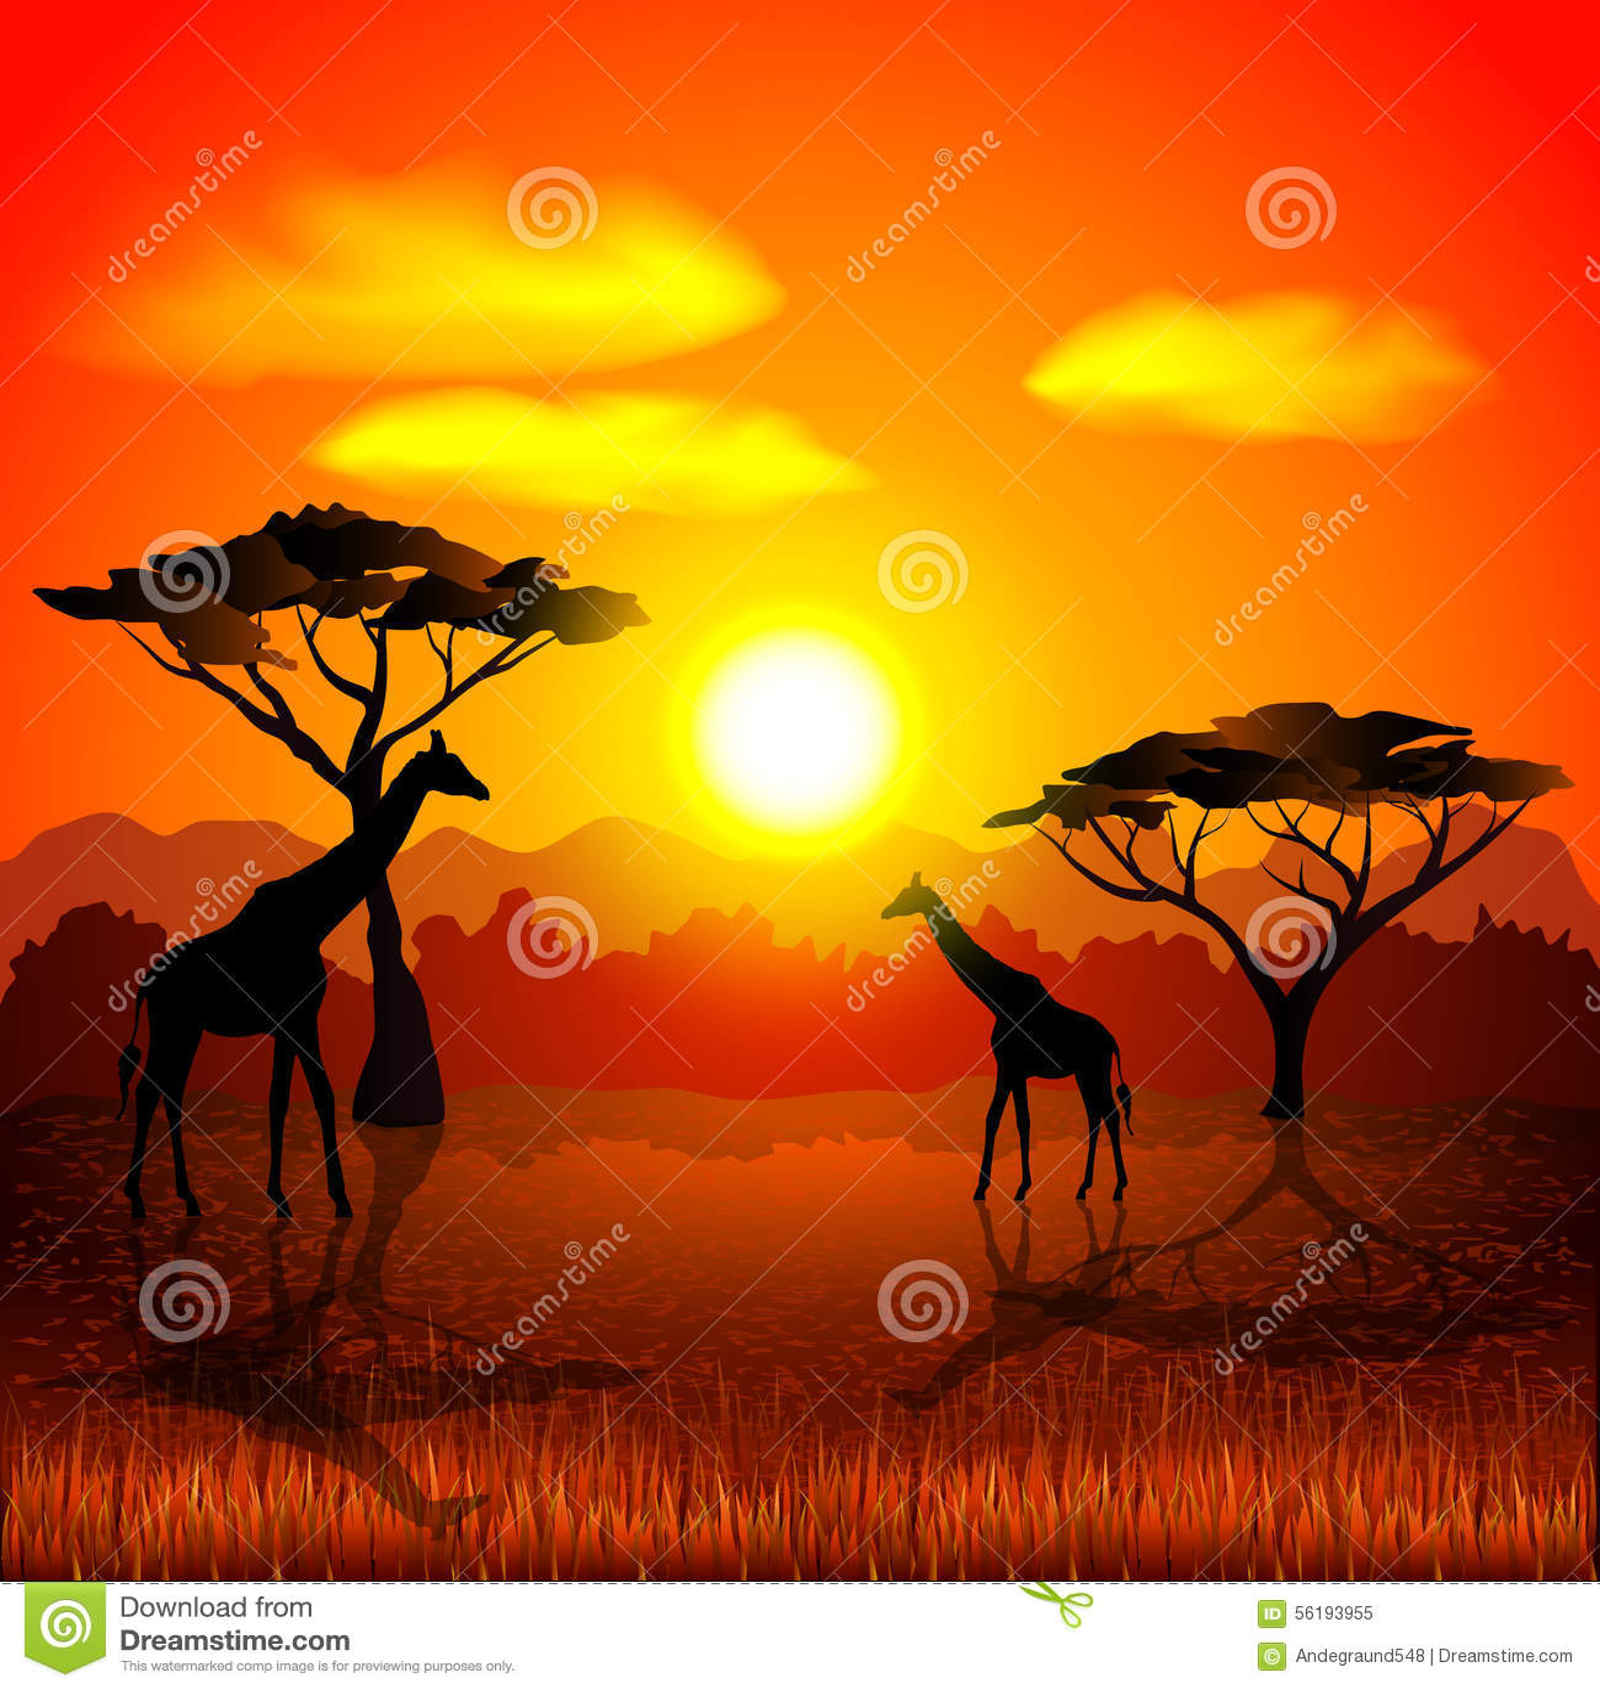 Sunset In African Savannah Vector Background Stock Vector